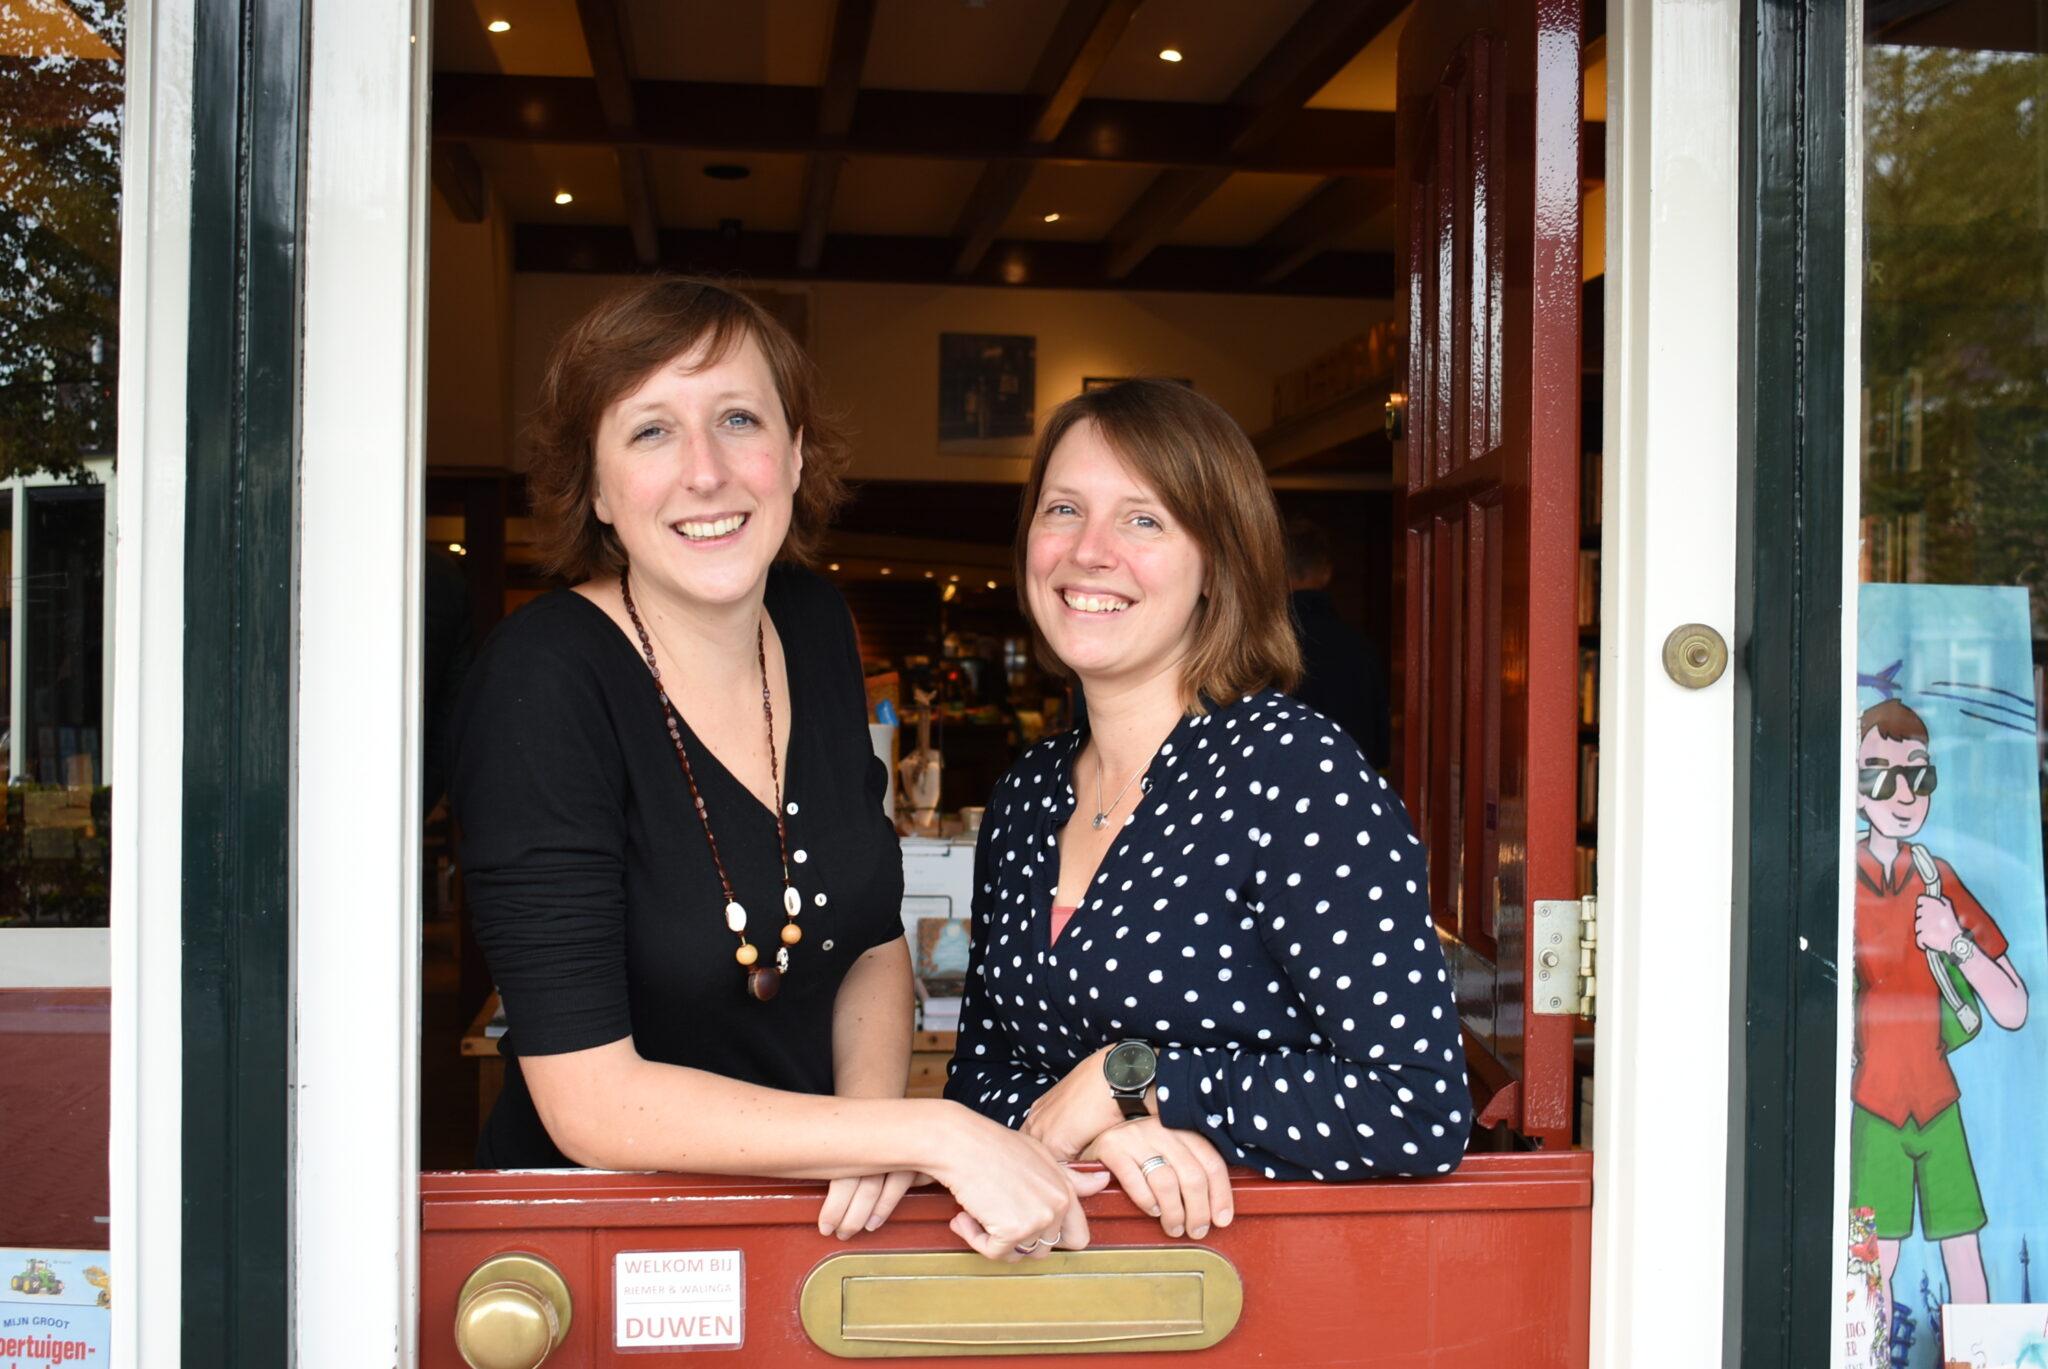 Boekhandel Riemer & Walinga in Ermelo zeven zussen wereldprimeur